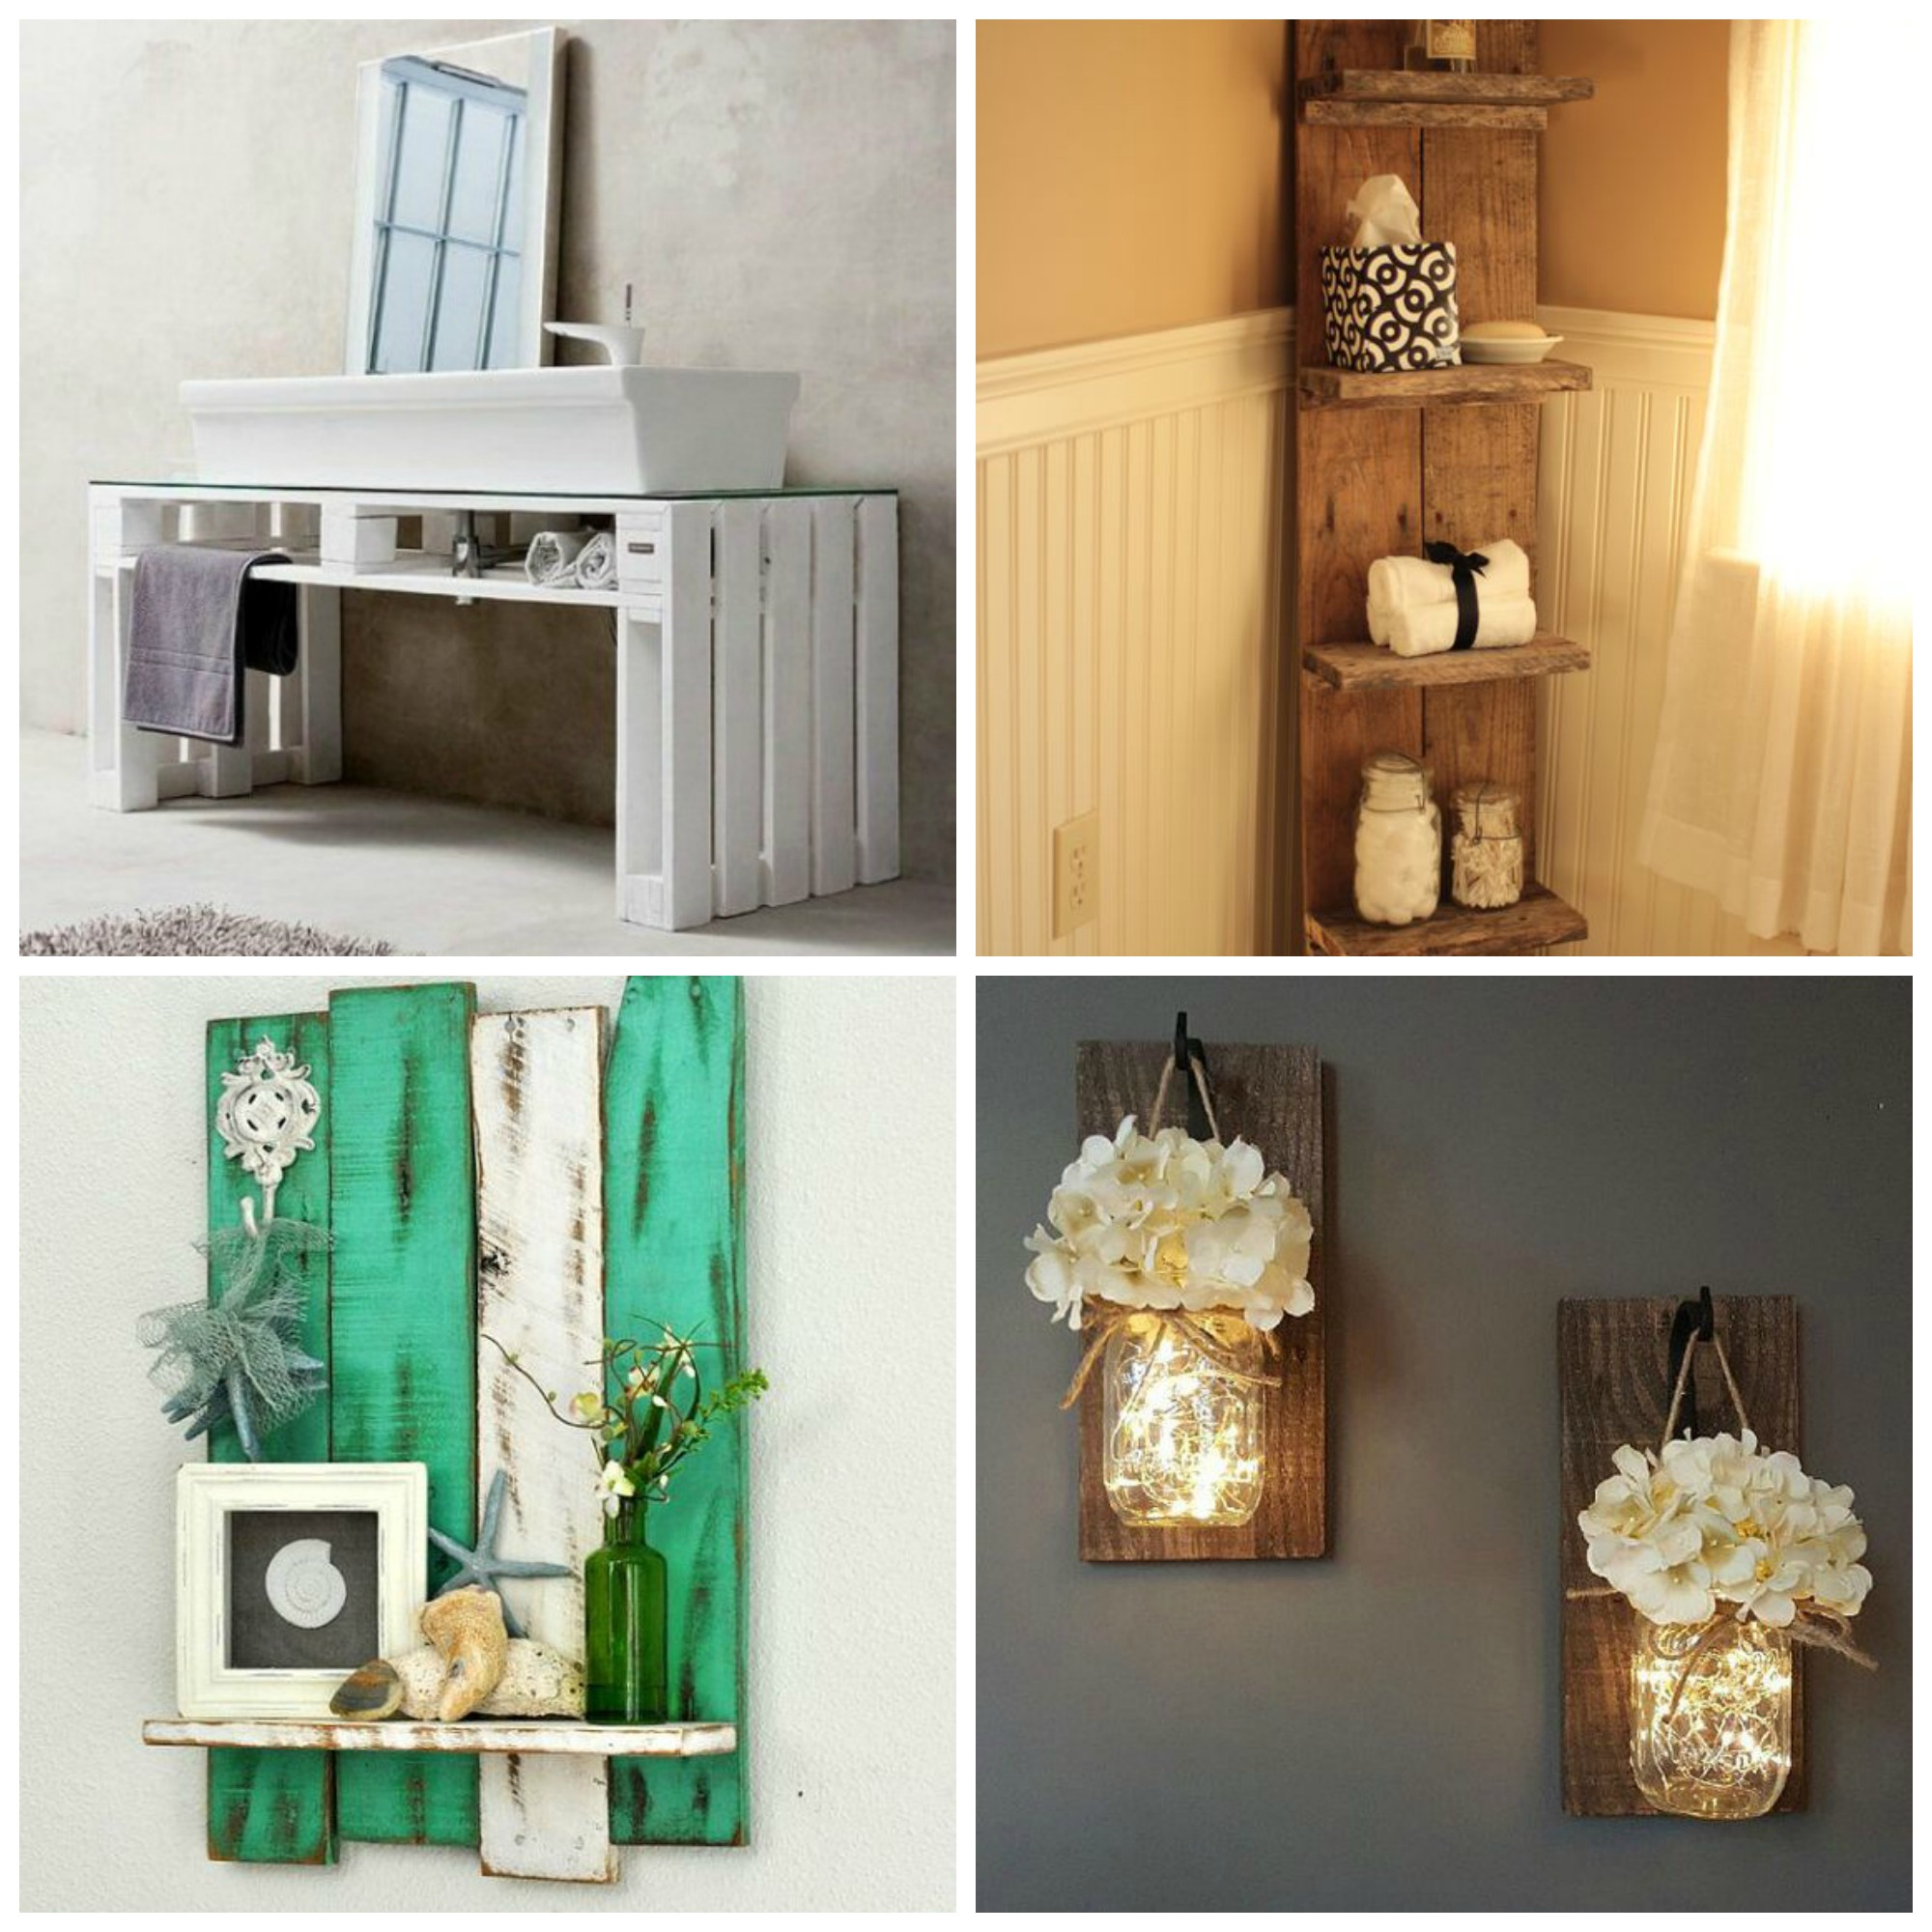 Pallet idee creative per arredare la casa al mare - Idee creative per la casa ...